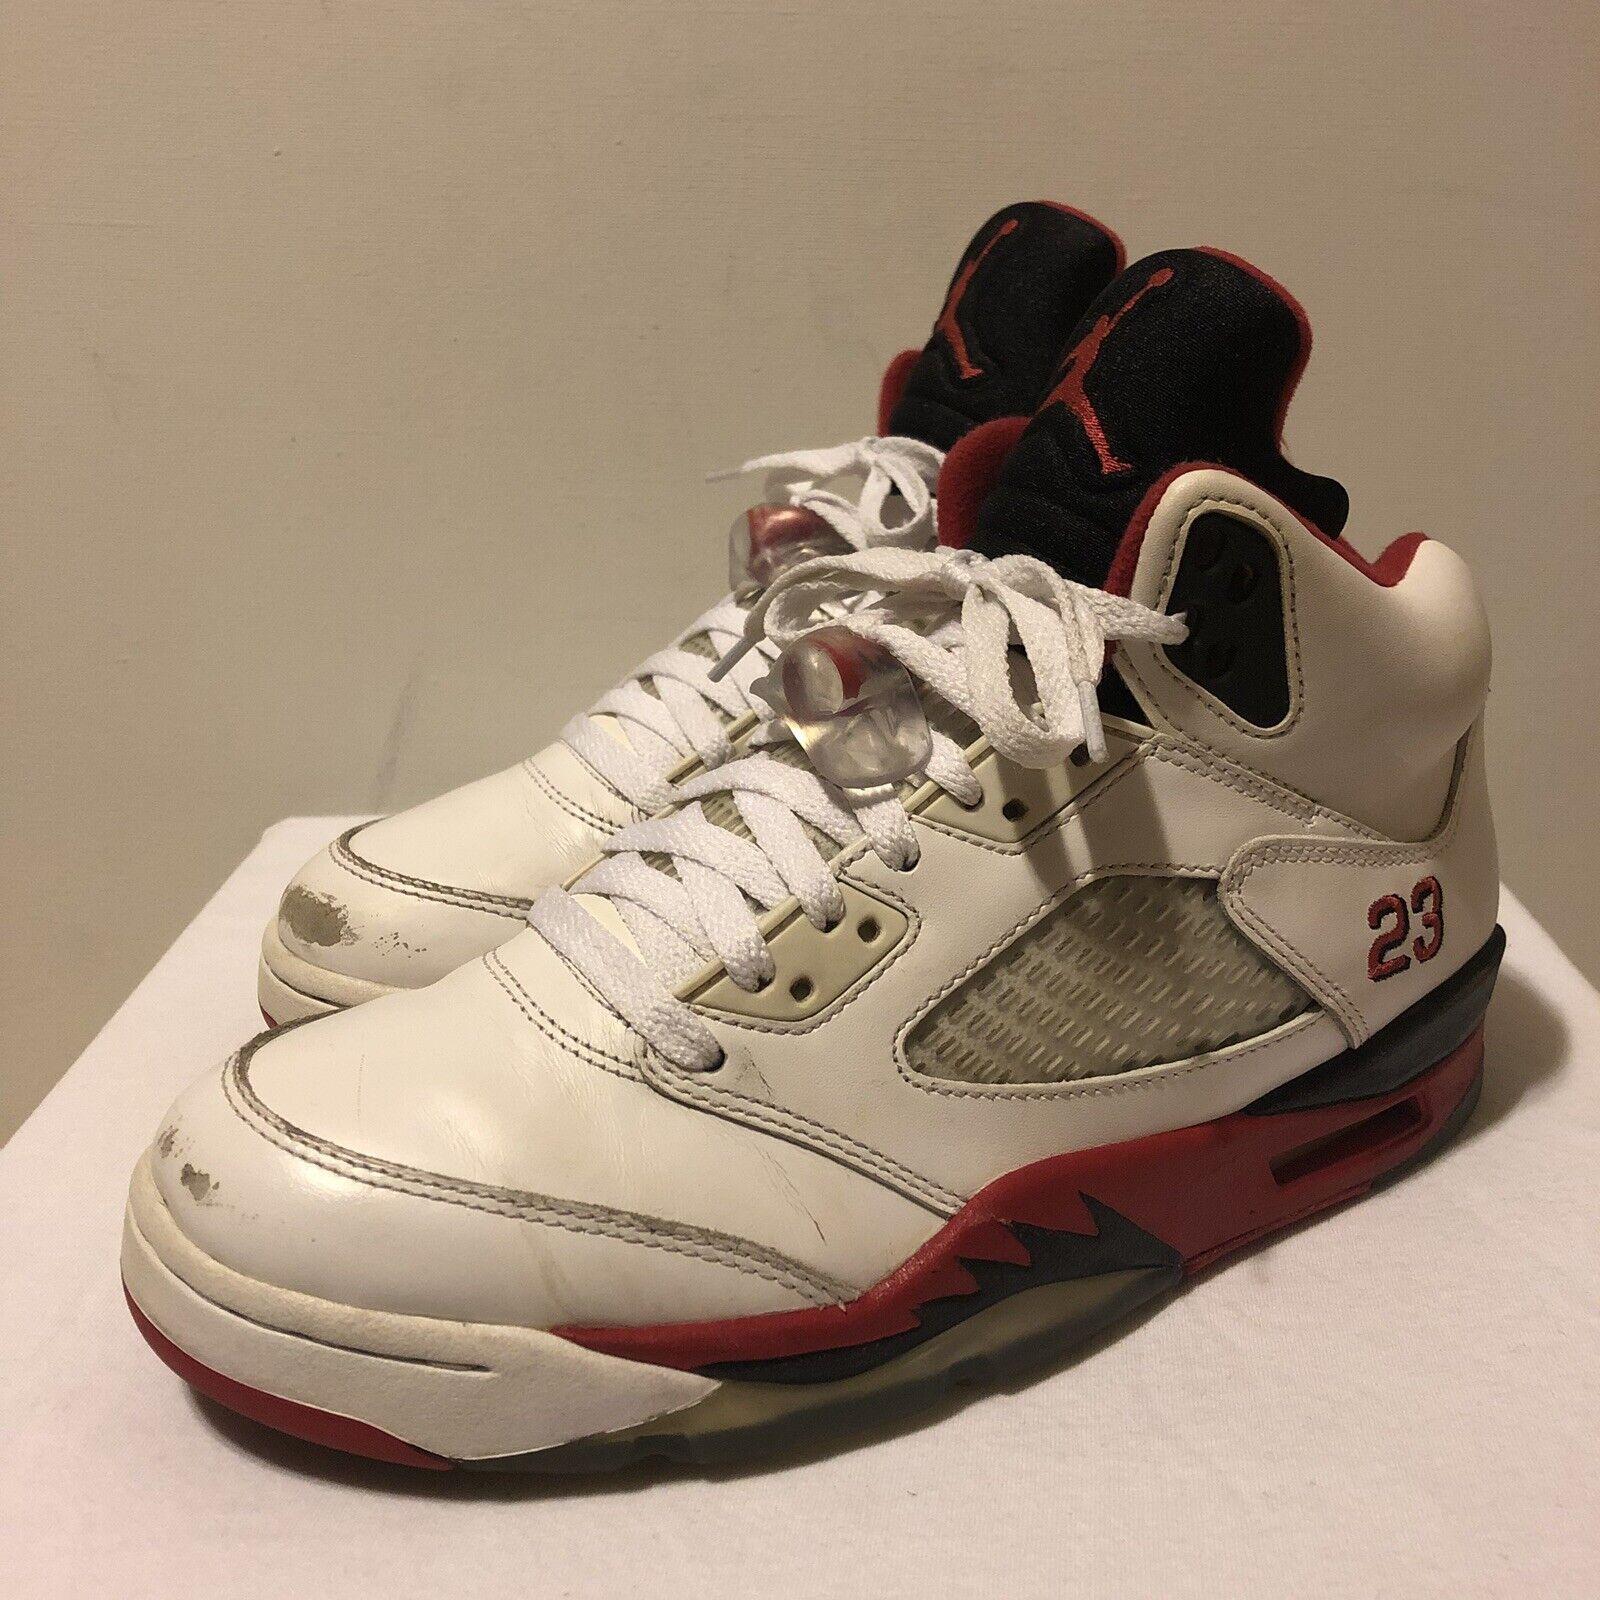 Air Jordan 5 Retro Fire Red Size 8